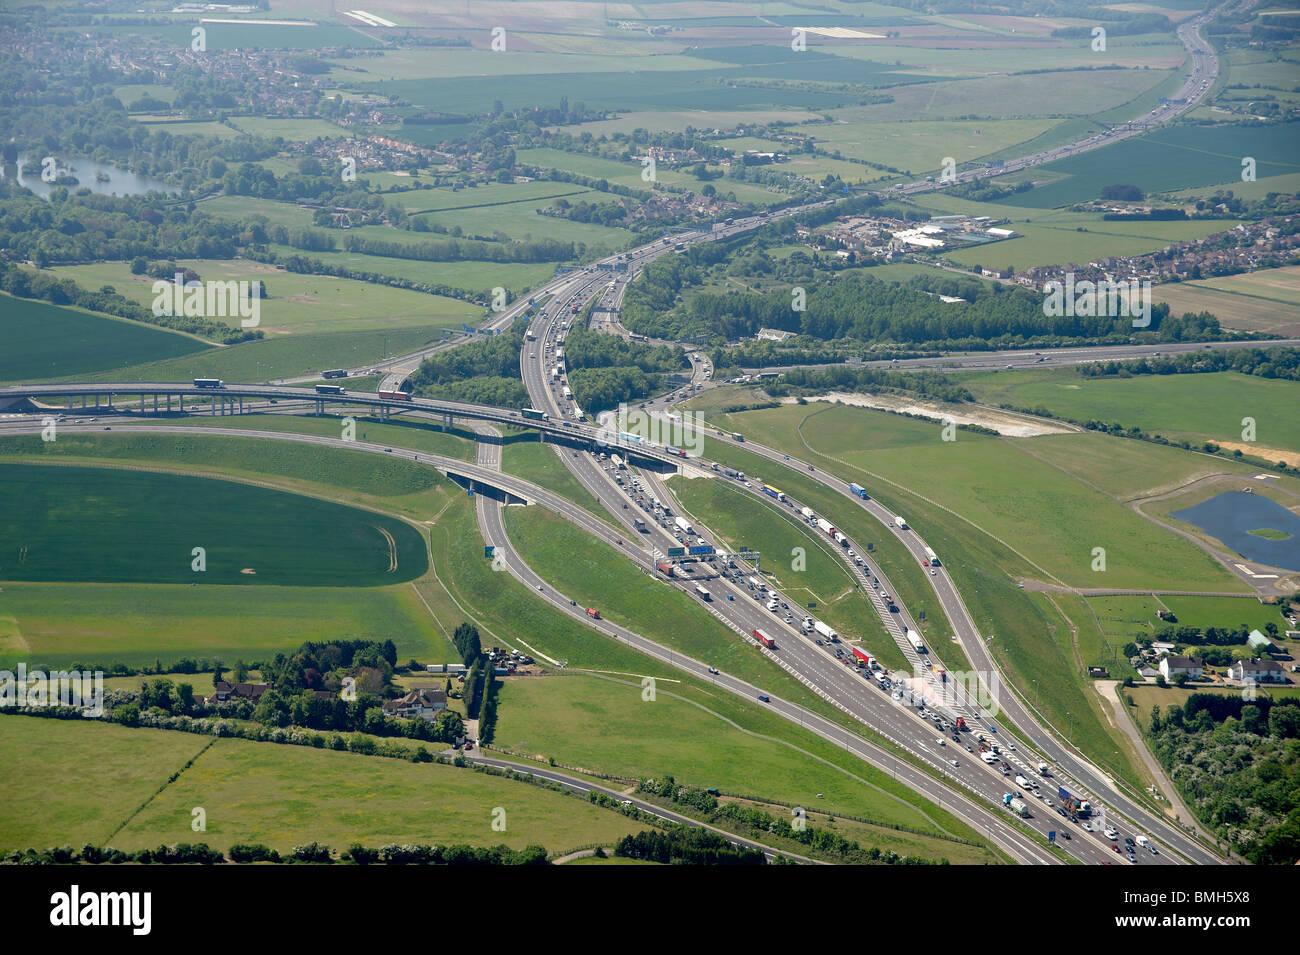 M25/M20 Interchange, just south of Dartford, South East England - Stock Image